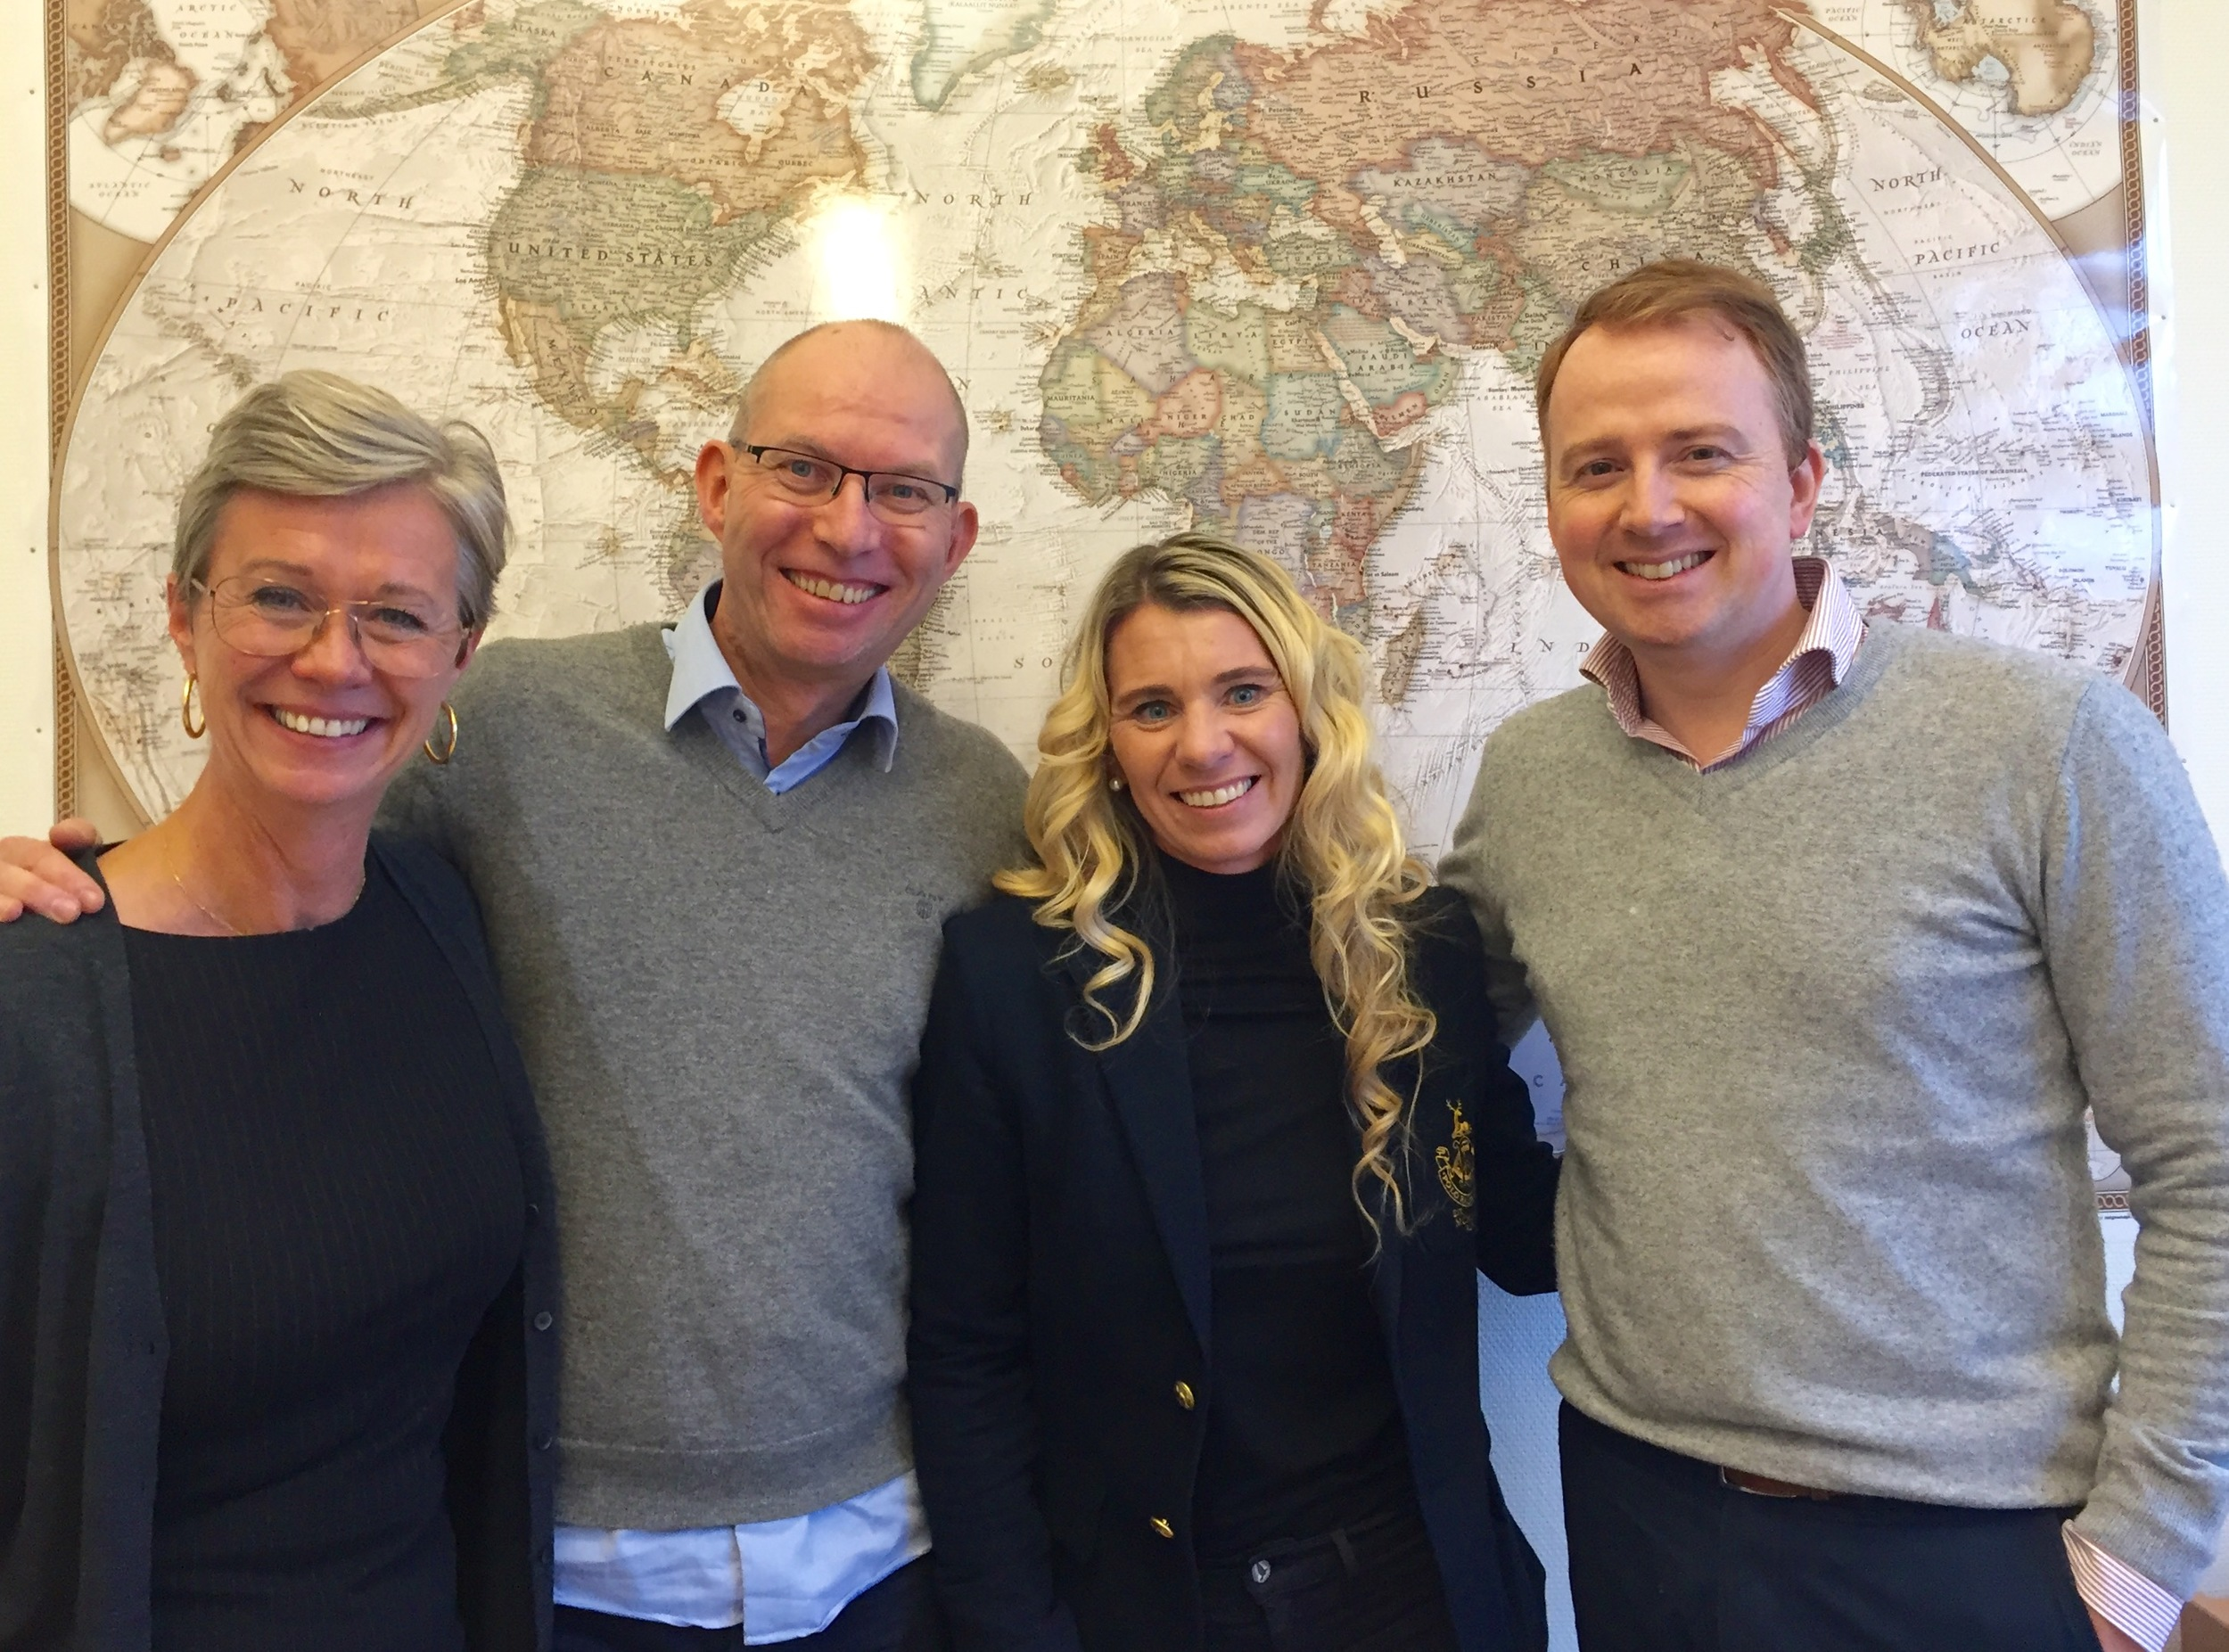 Carina Bergquist fra KLM, Odd Roar Lange/Thetravelinspector, Trude Håland/Trudestrening og Yoram Franzen fra KLM.